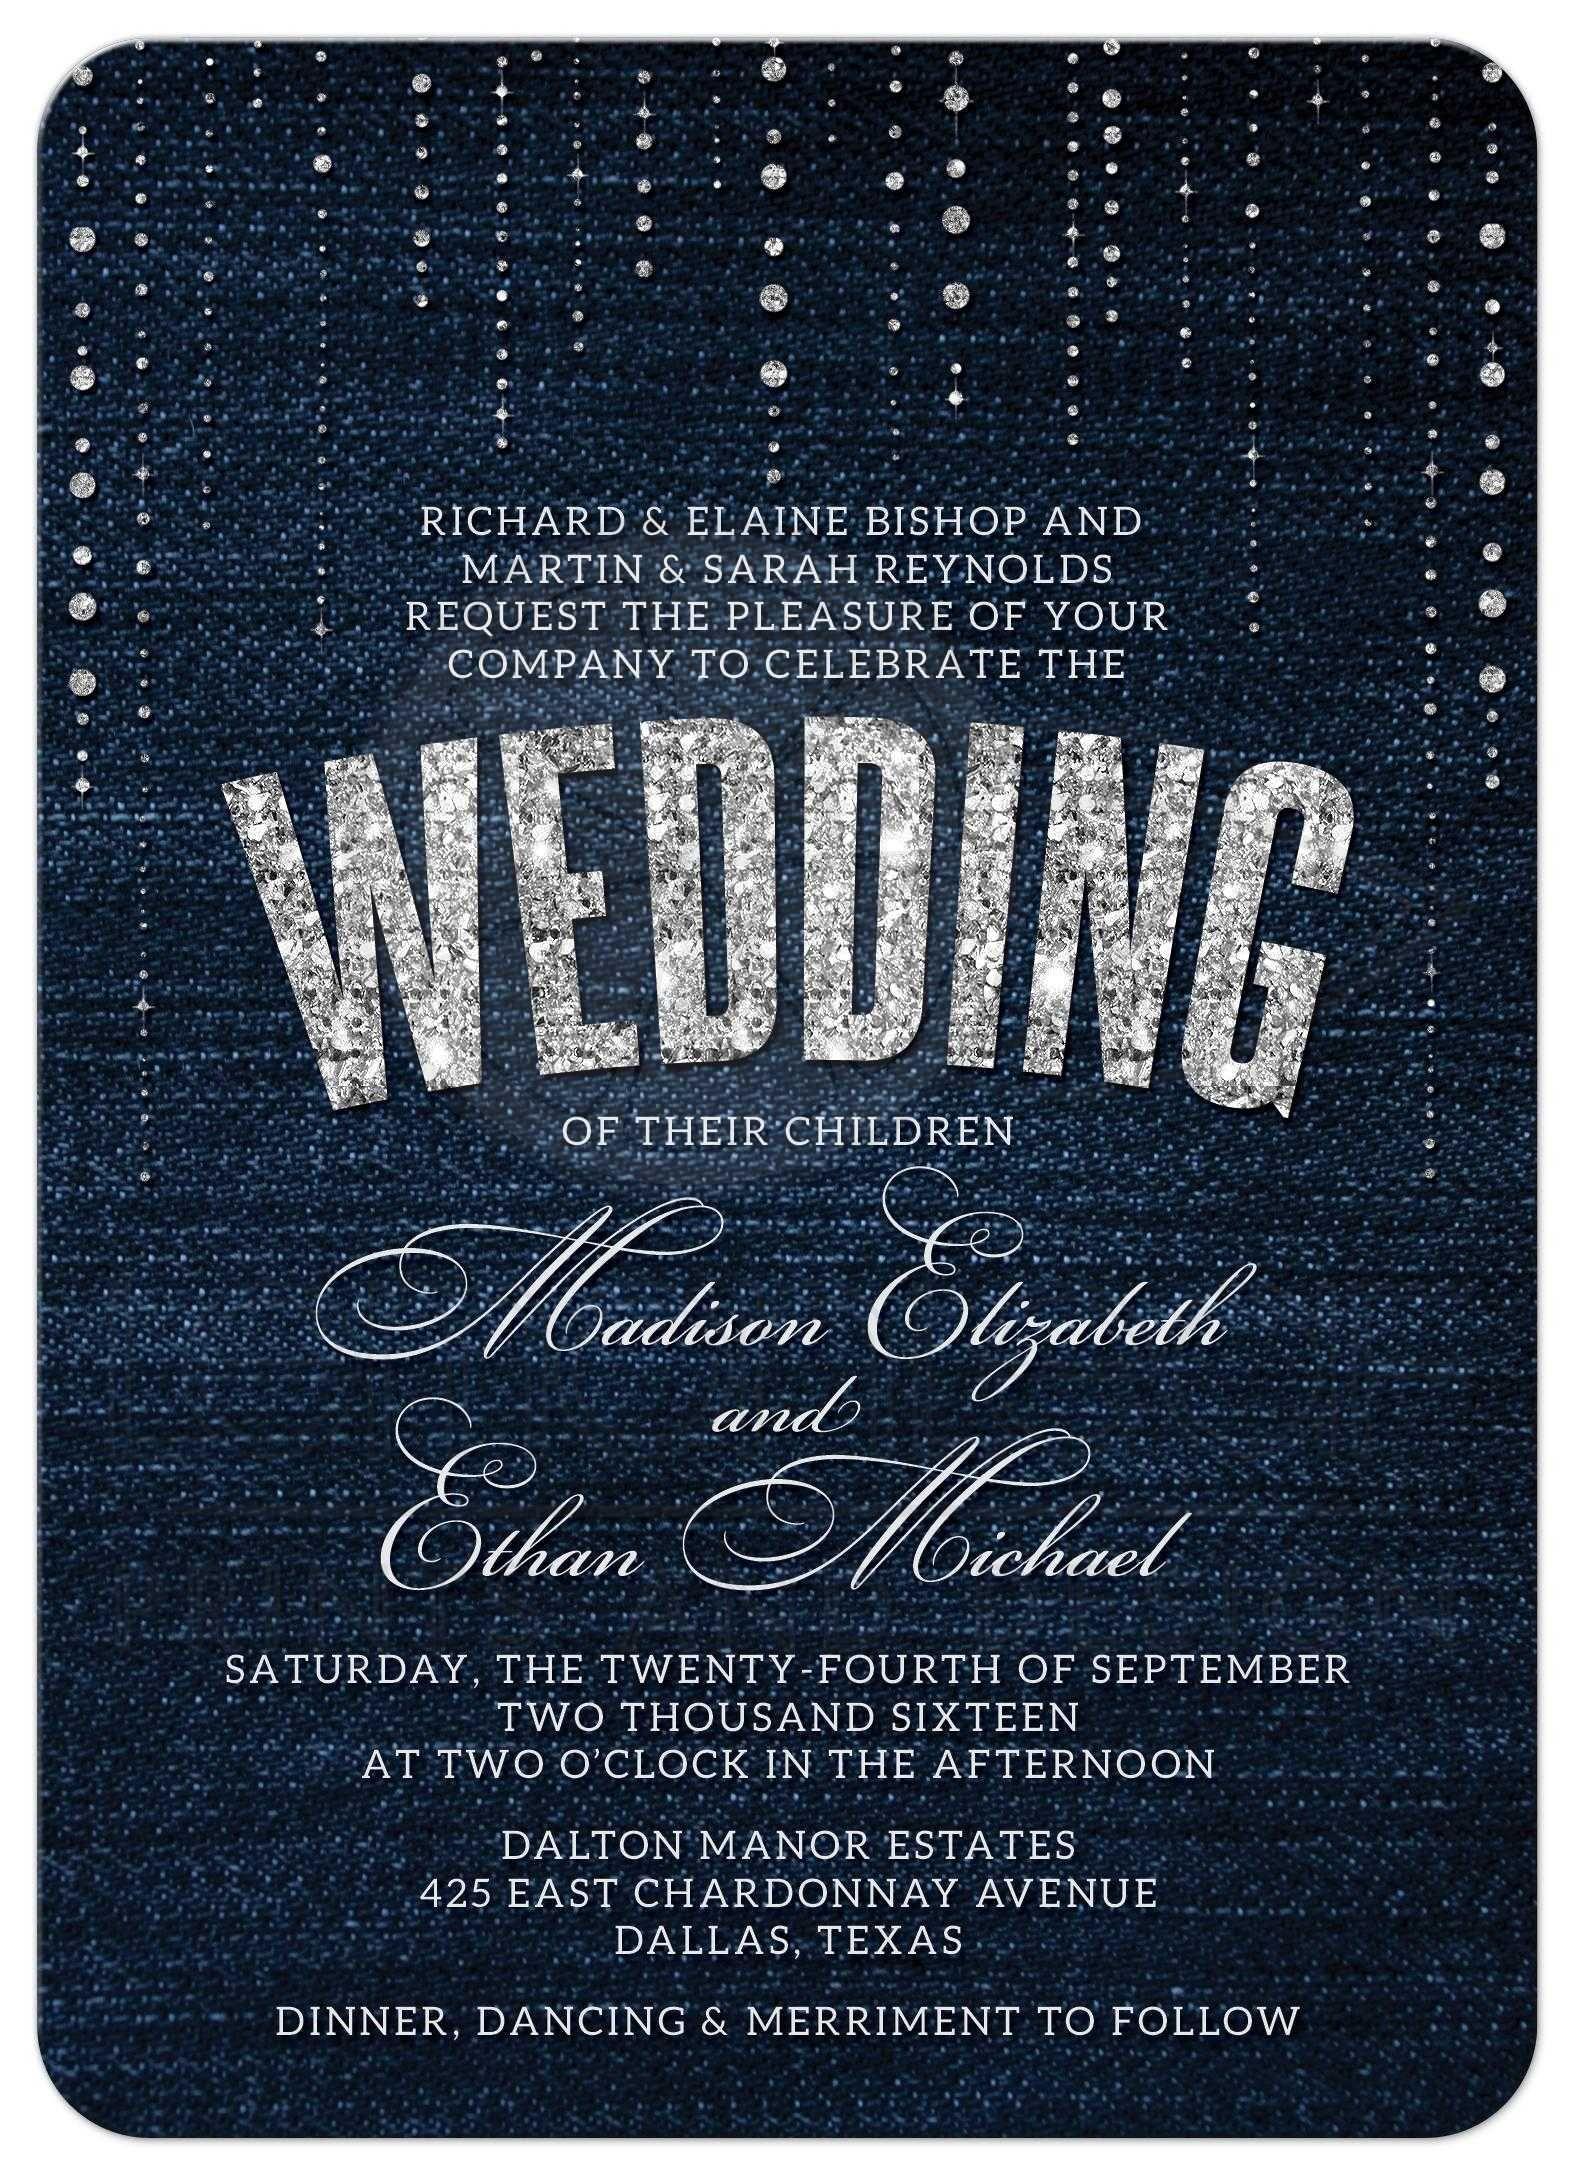 bling wedding invitations Denim Diamonds Wedding Invitations front